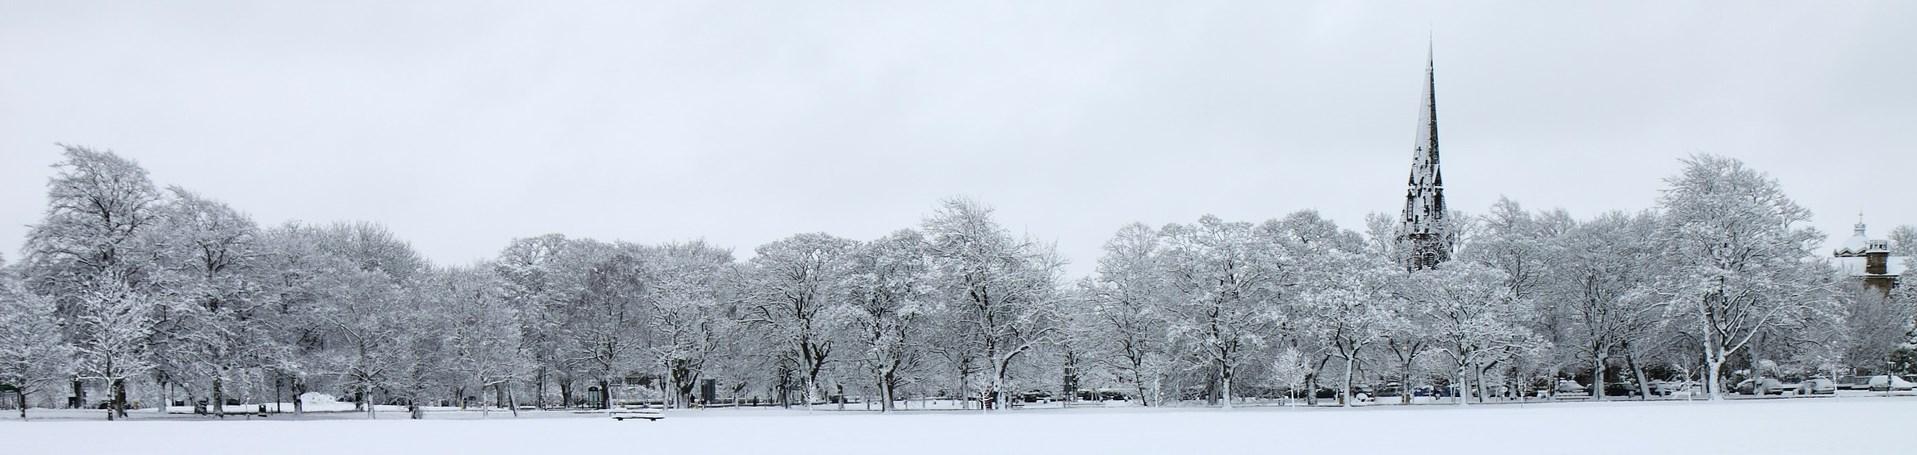 Januar, Natur, Landschaft